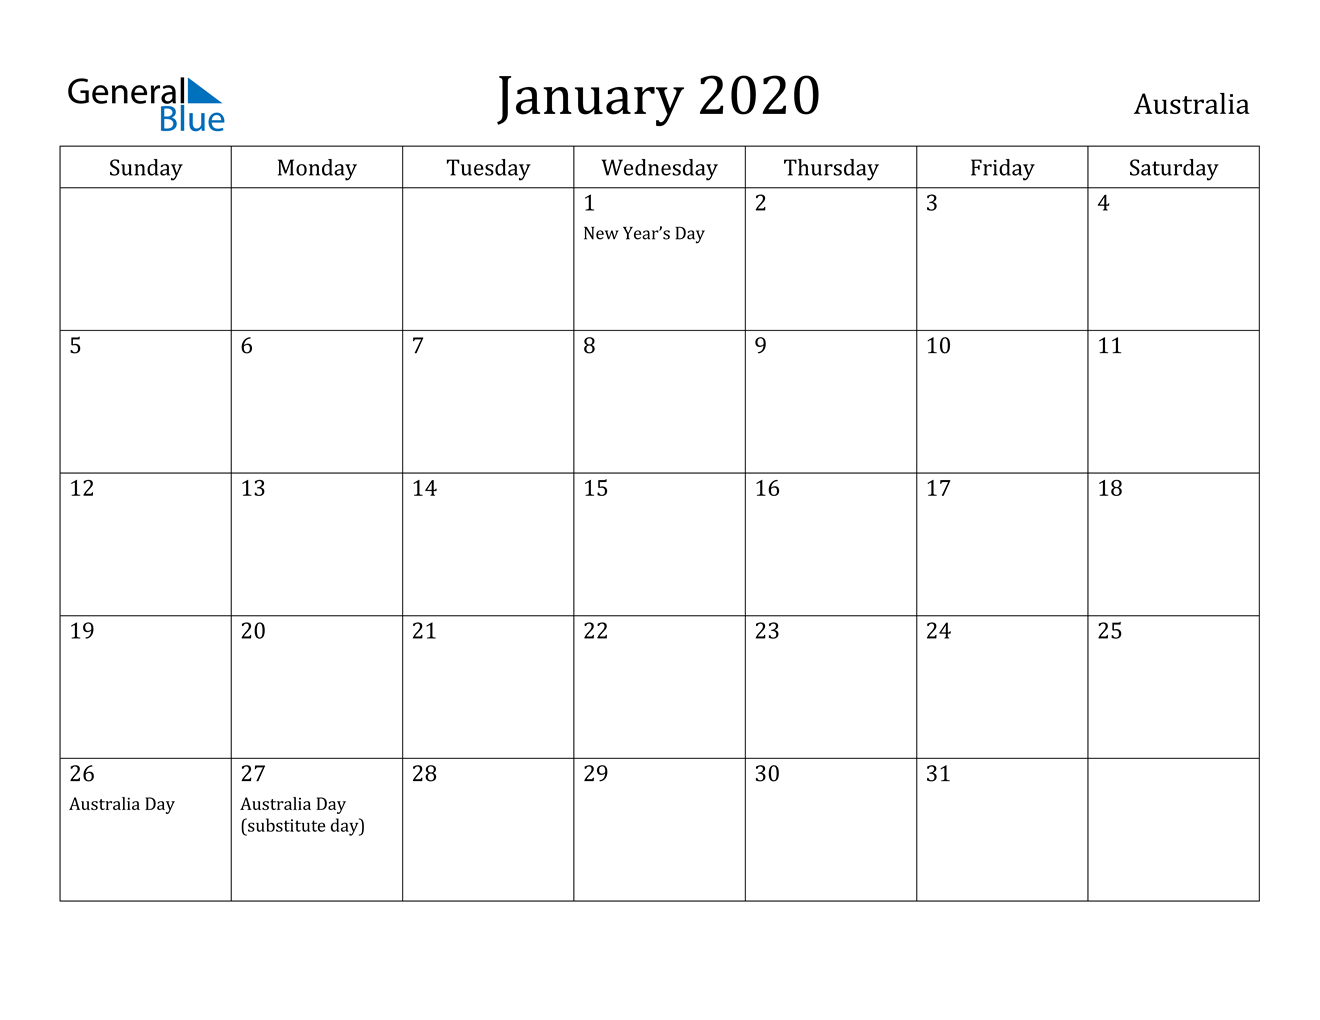 Image of January 2020 Australia Calendar with Holidays Calendar